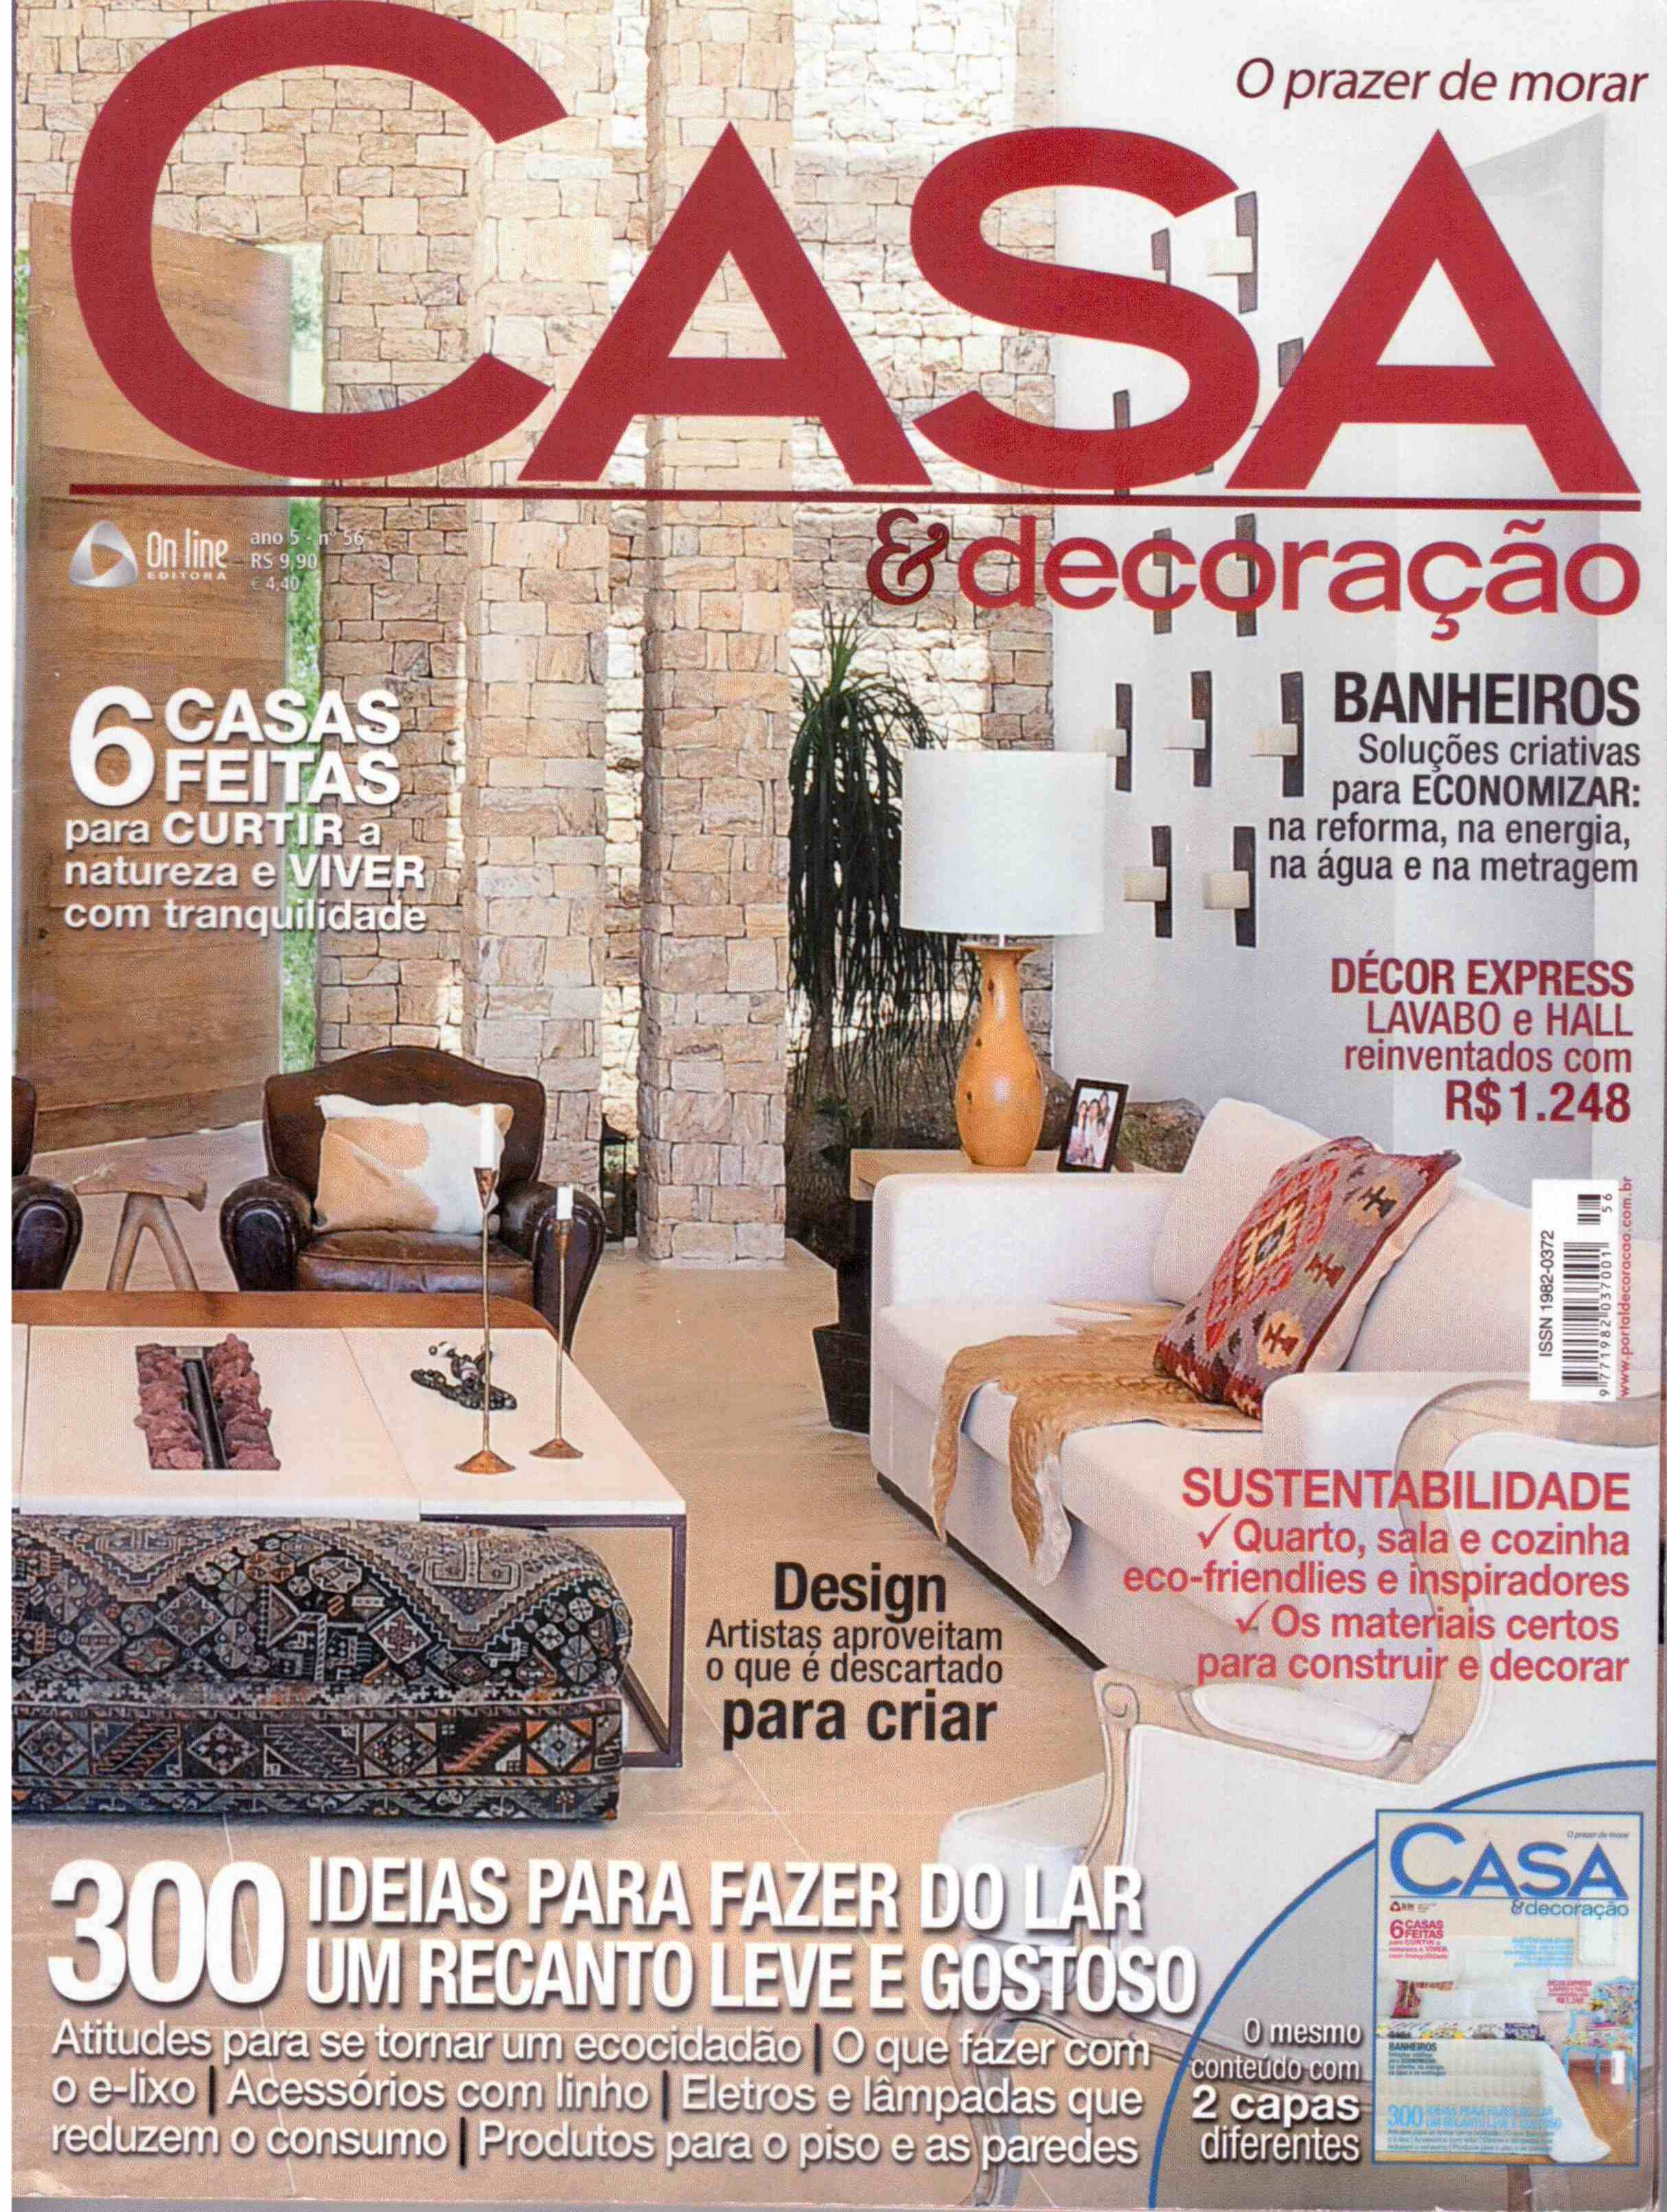 decoracao alternativa de casas : decoracao alternativa de casas:CASA ALTERNATIVA na REVISTA CASA & DECORAÇÃO